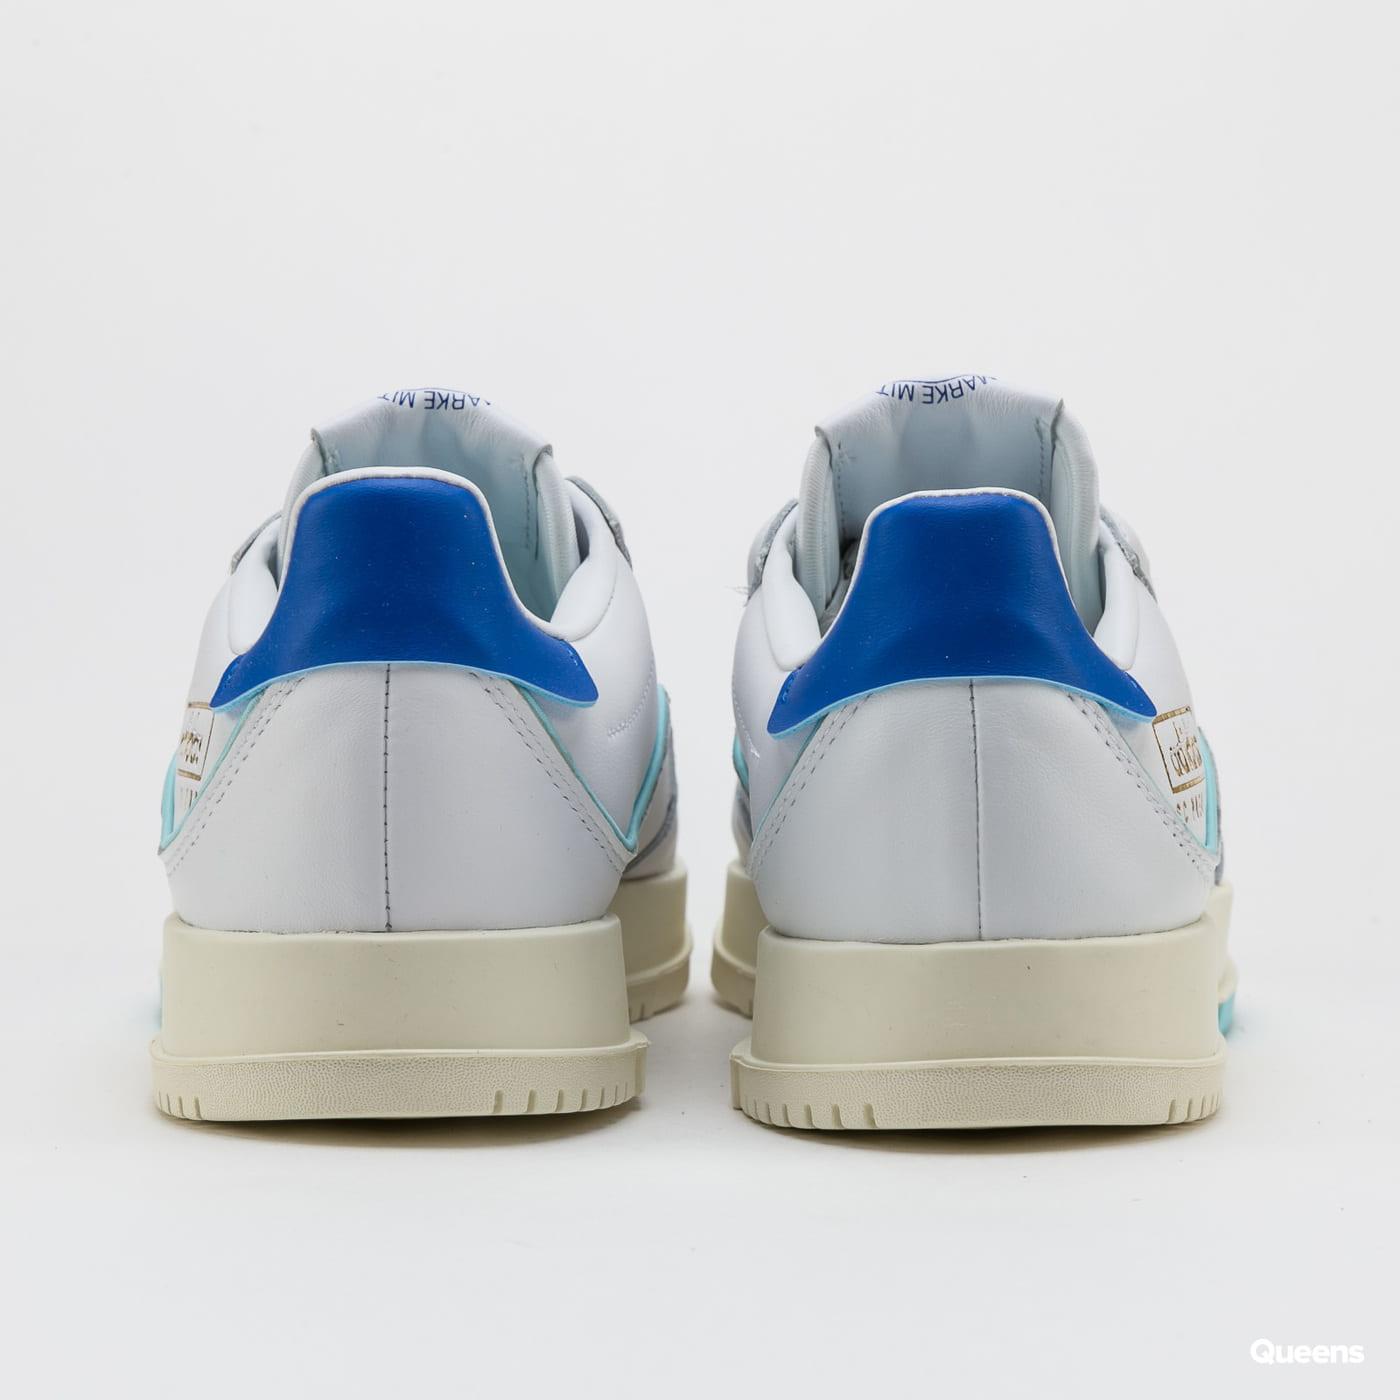 adidas Originals SC Premiere ftwwht / blue / bluzes